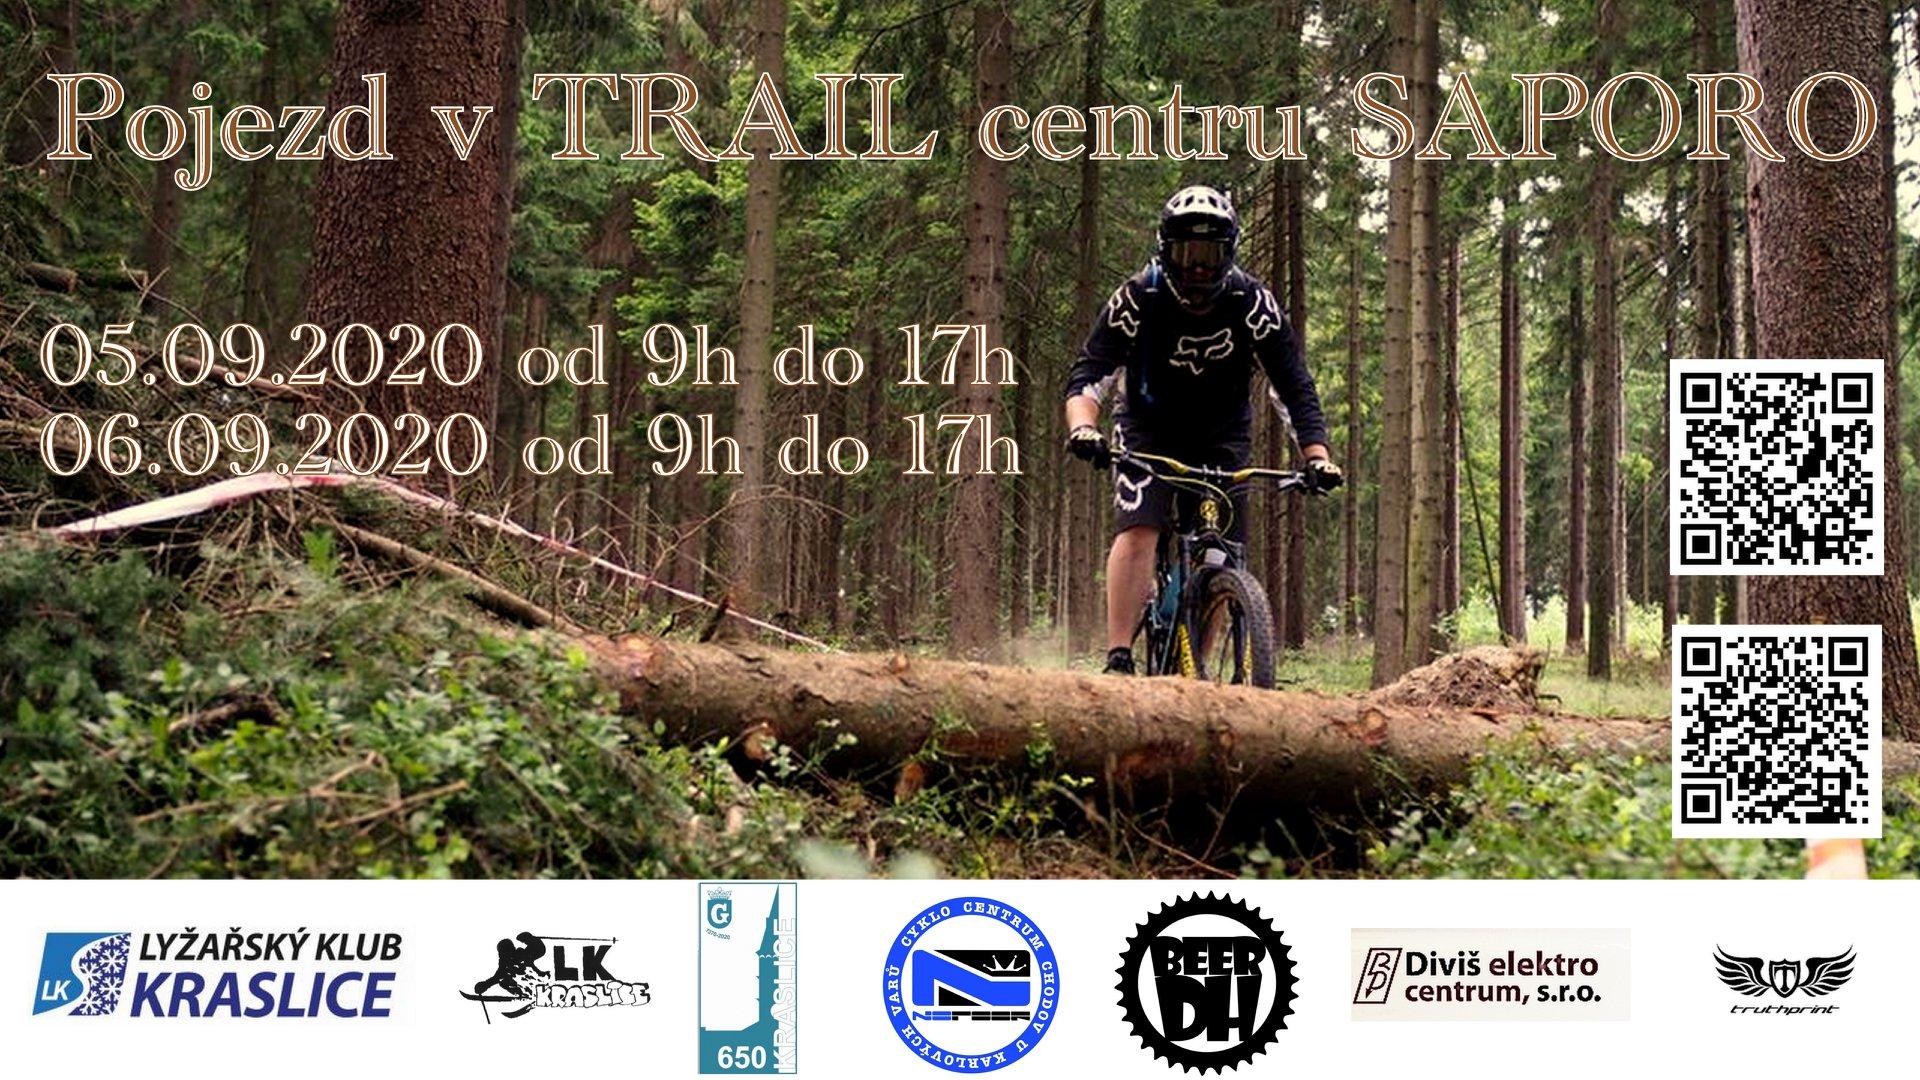 trail_centrum_saporo_kraslice